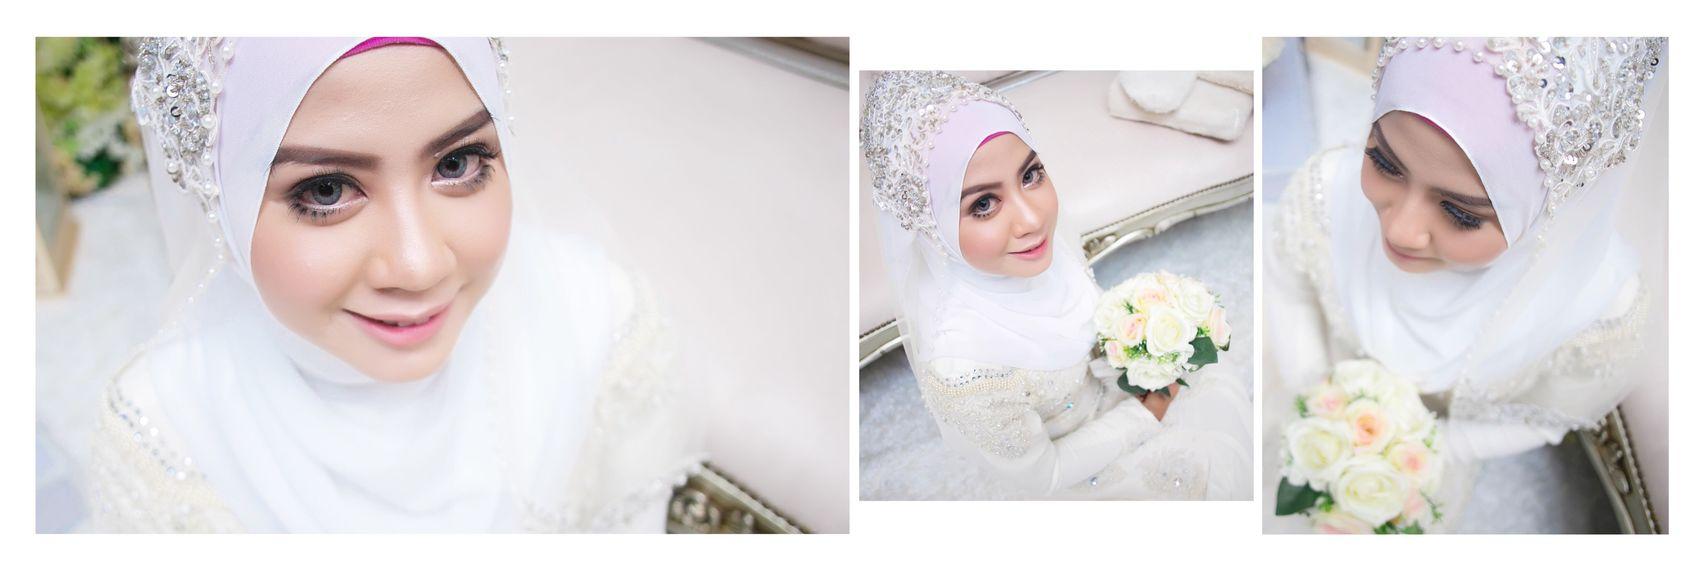 Custom Album Layouts.. ready to printing.. Crystalcustomalbum Exclusive  Wedding Photography Design Moderndesign Portrait Canon6d Ef24mmf1.4L Ef50mmf1.4 Ef135mmf2L LLens 600exrt